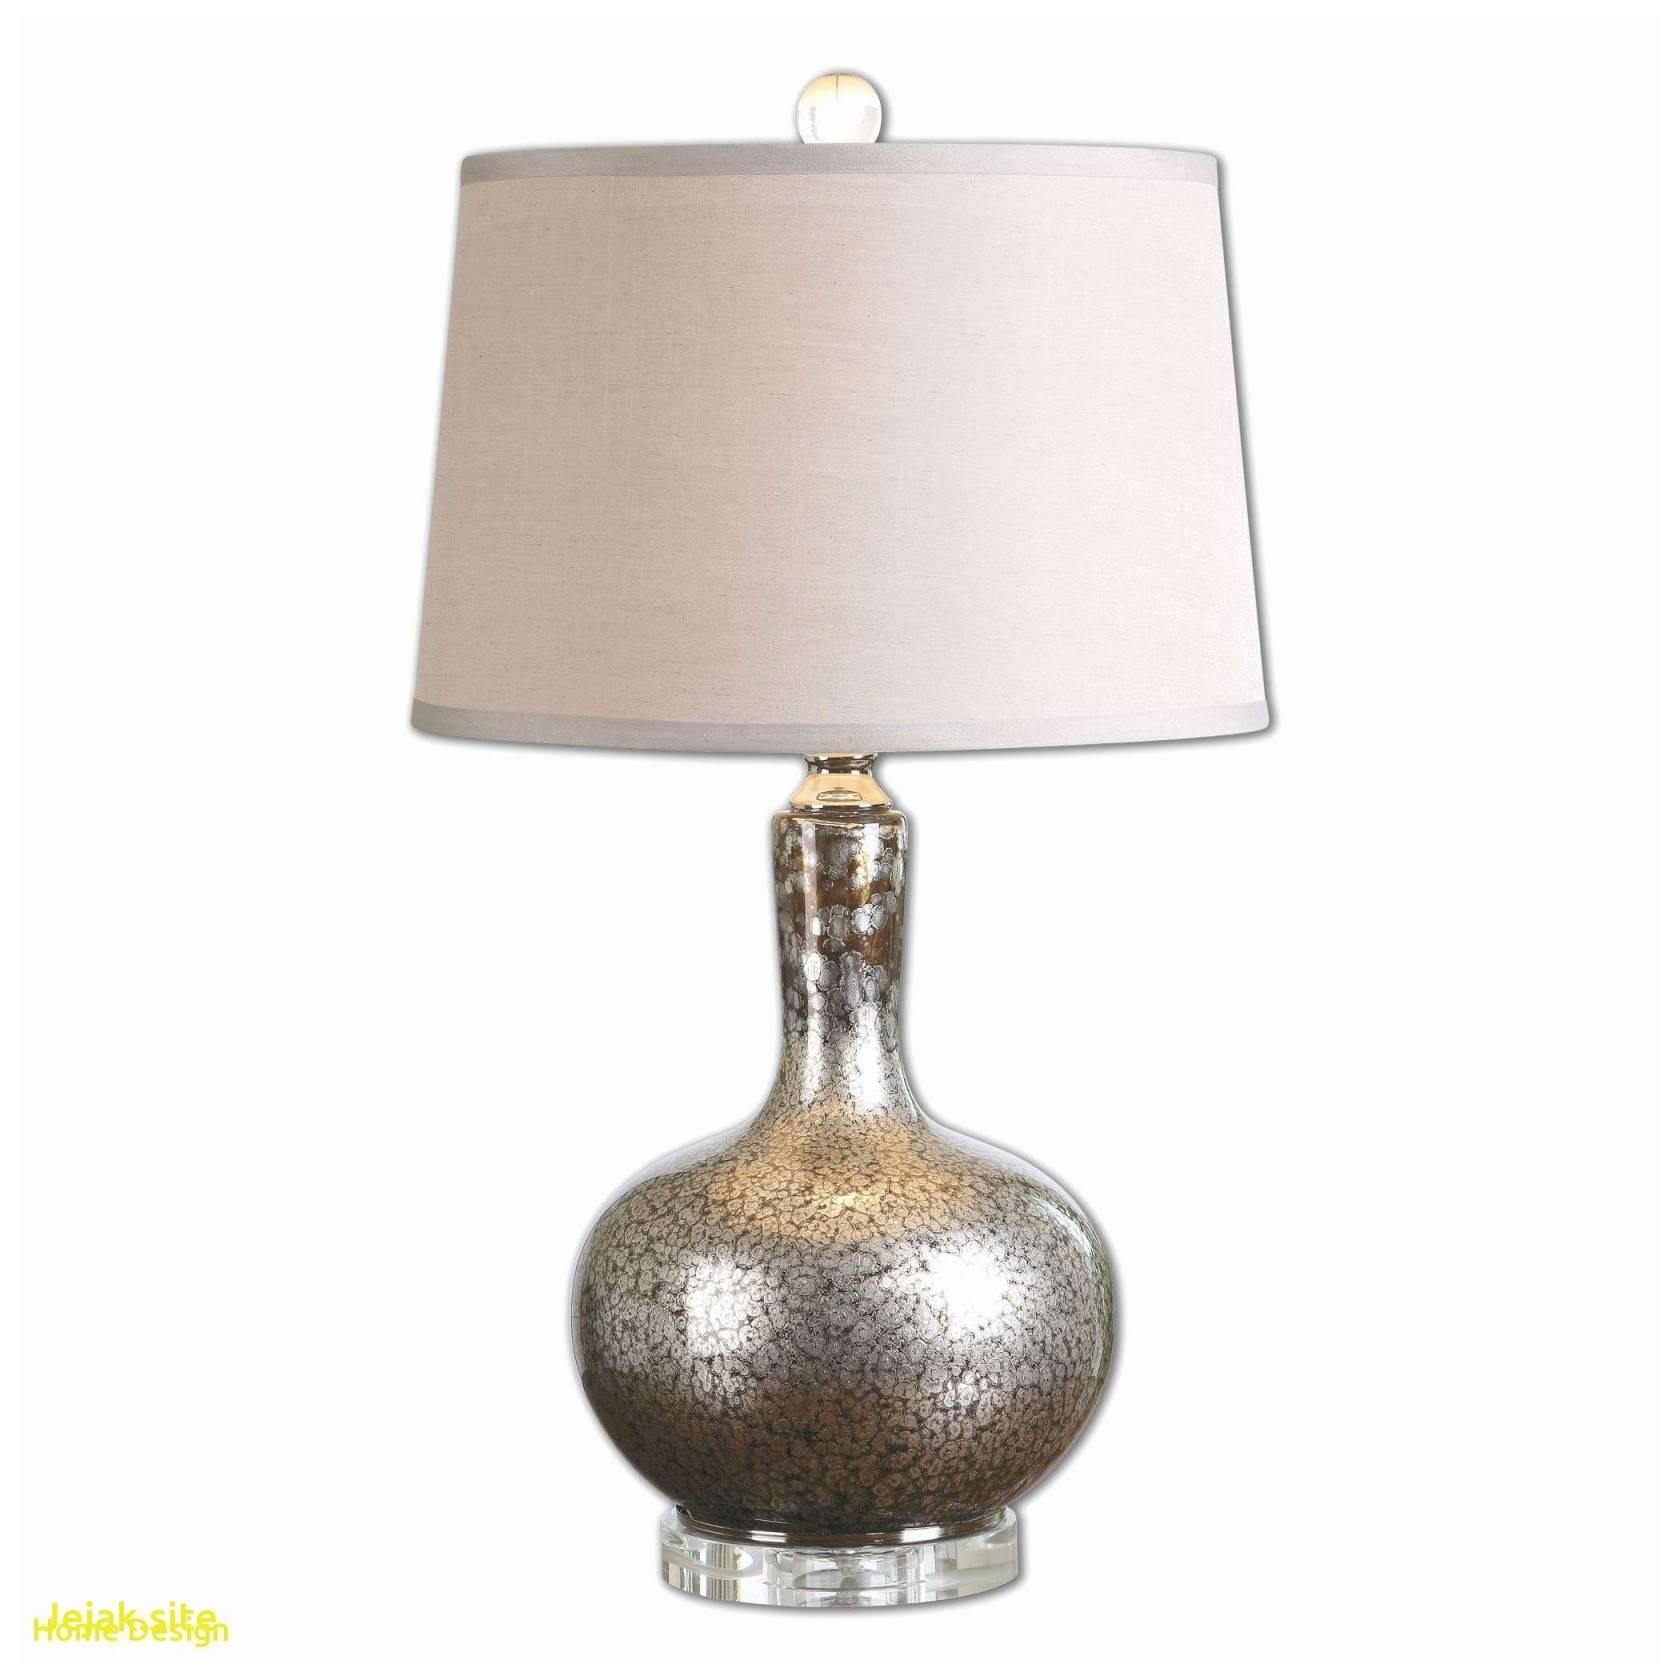 modern bedside lamp best modern table lamps australia of modern bedside lamp